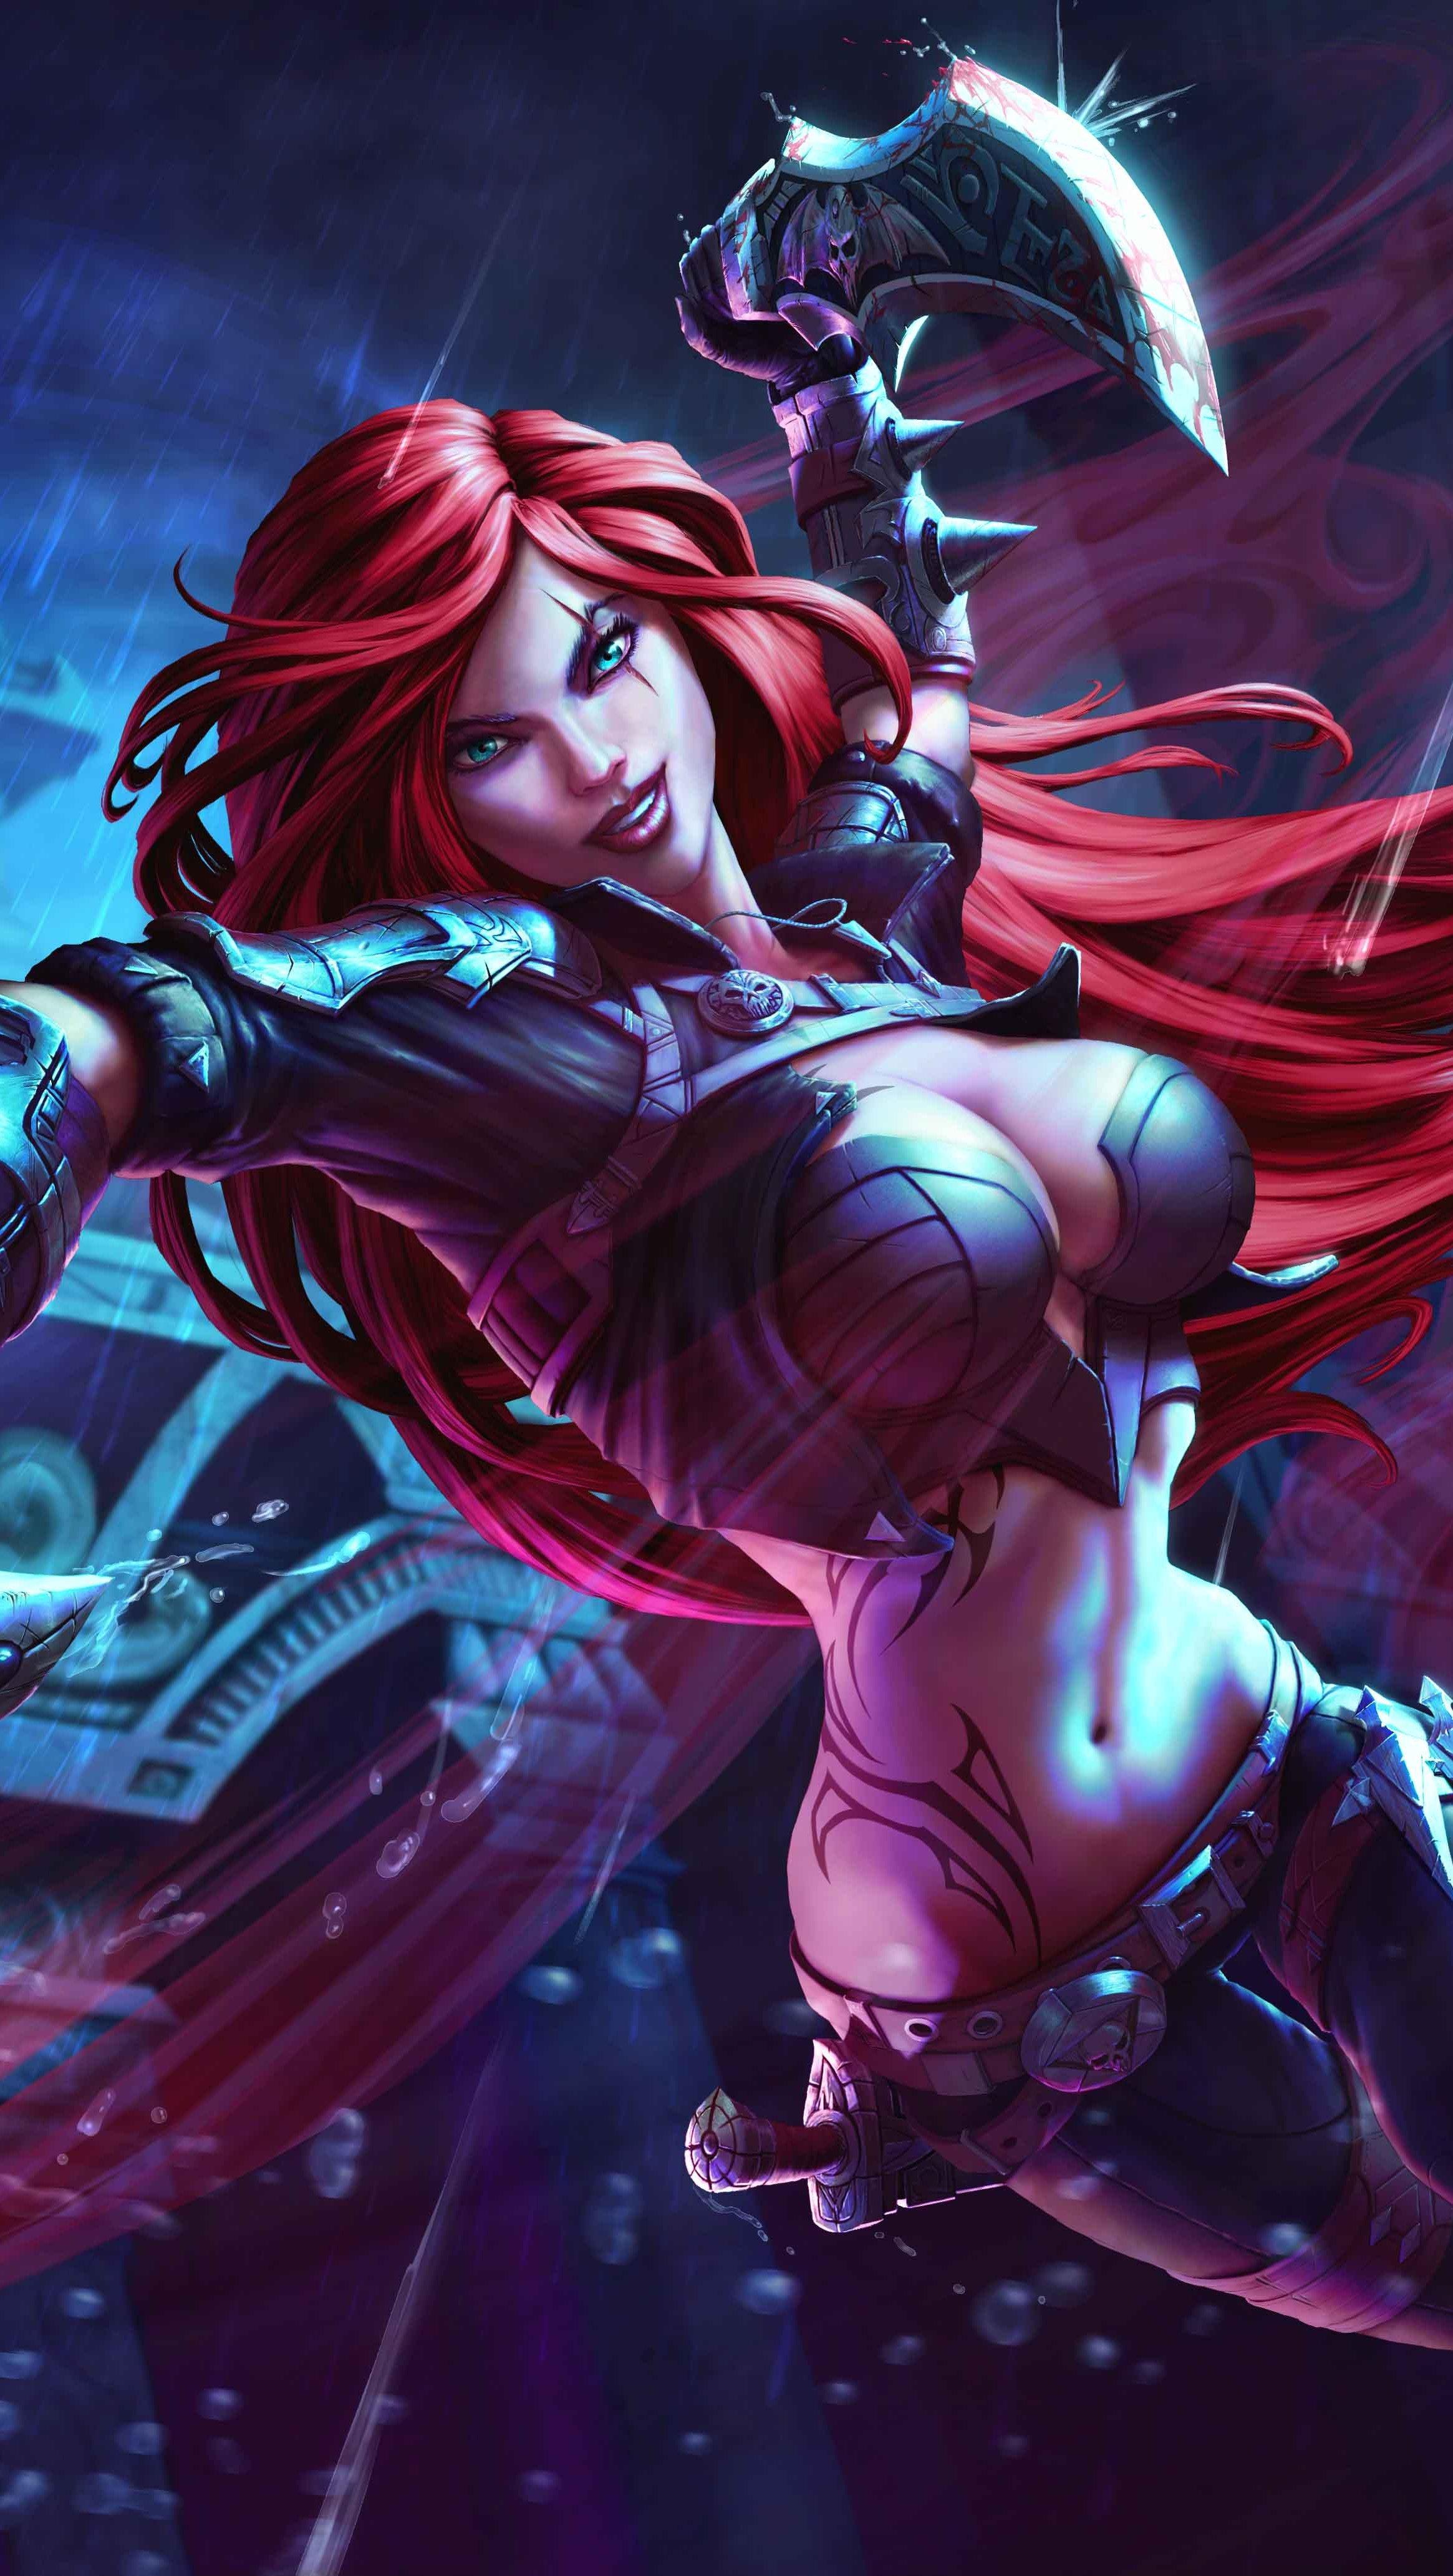 Fondos de pantalla Katarina League Of Legends Vertical